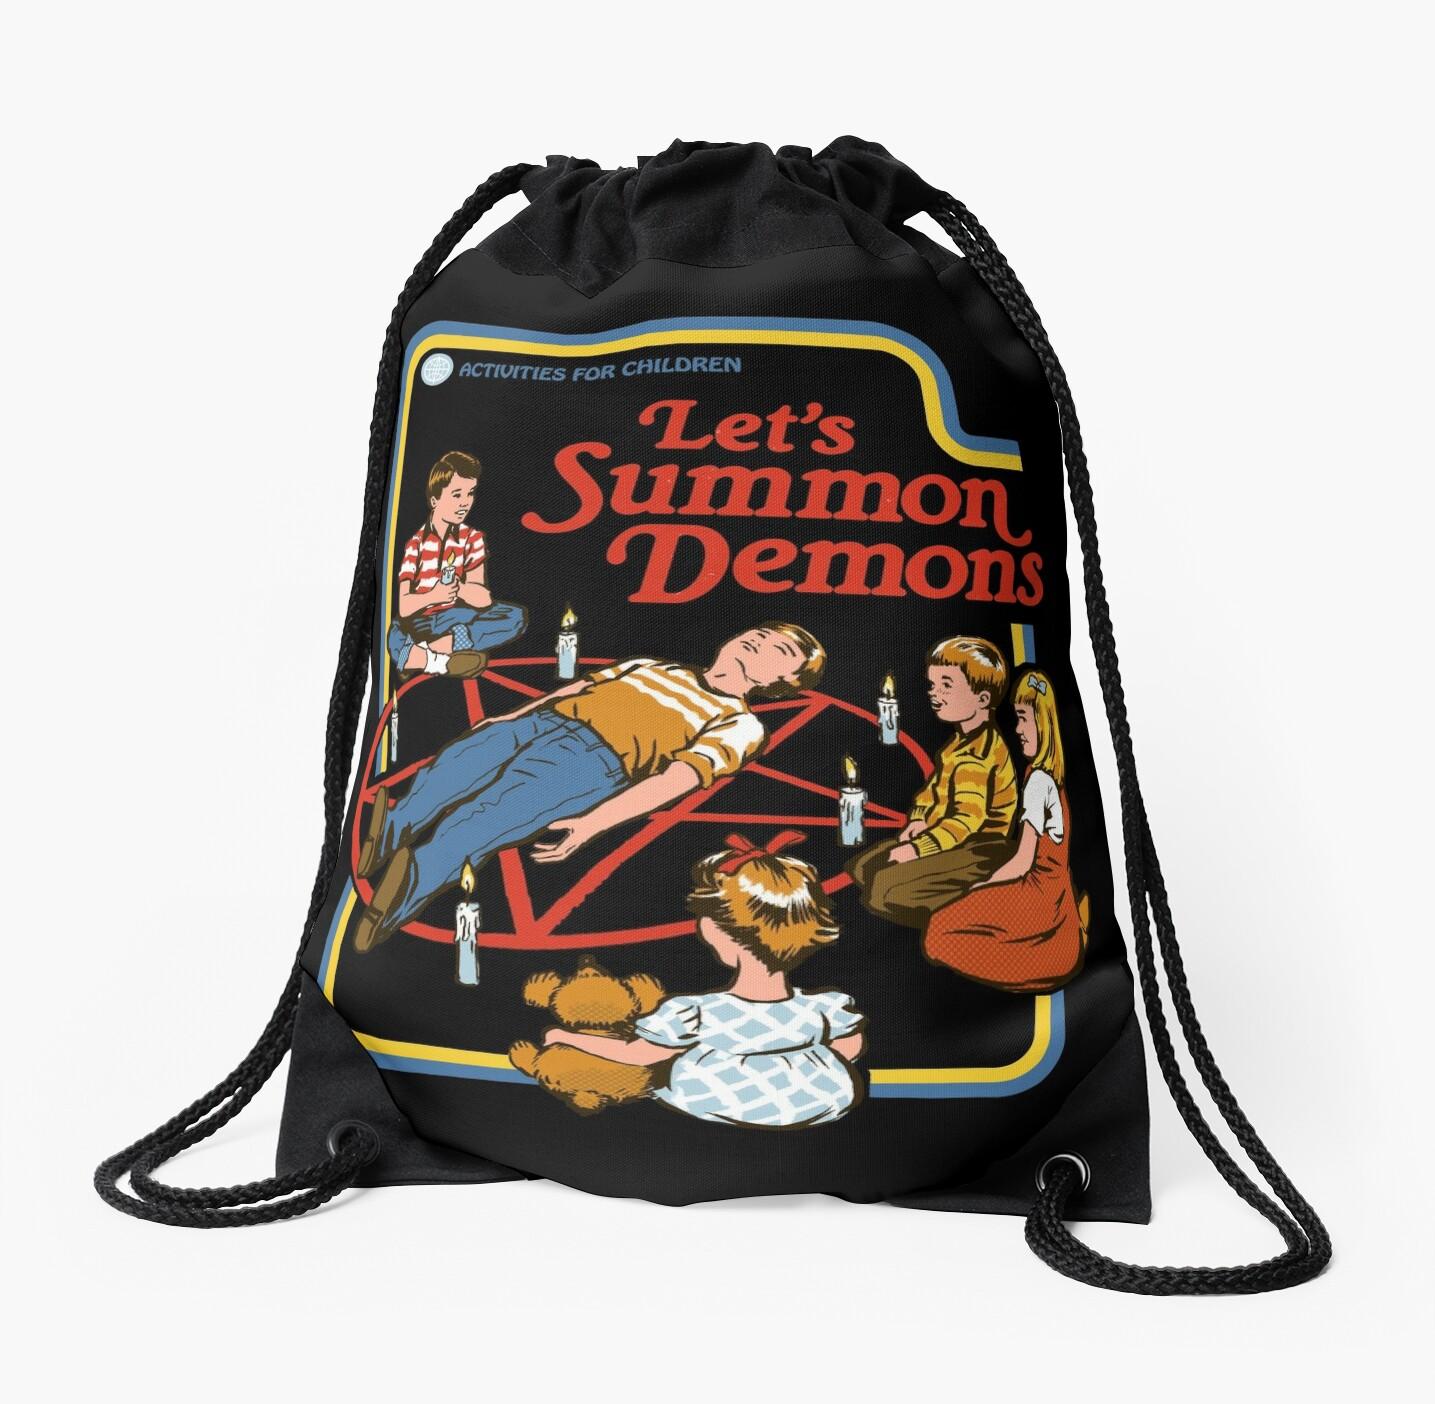 Let's Summon Demons by Steven Rhodes